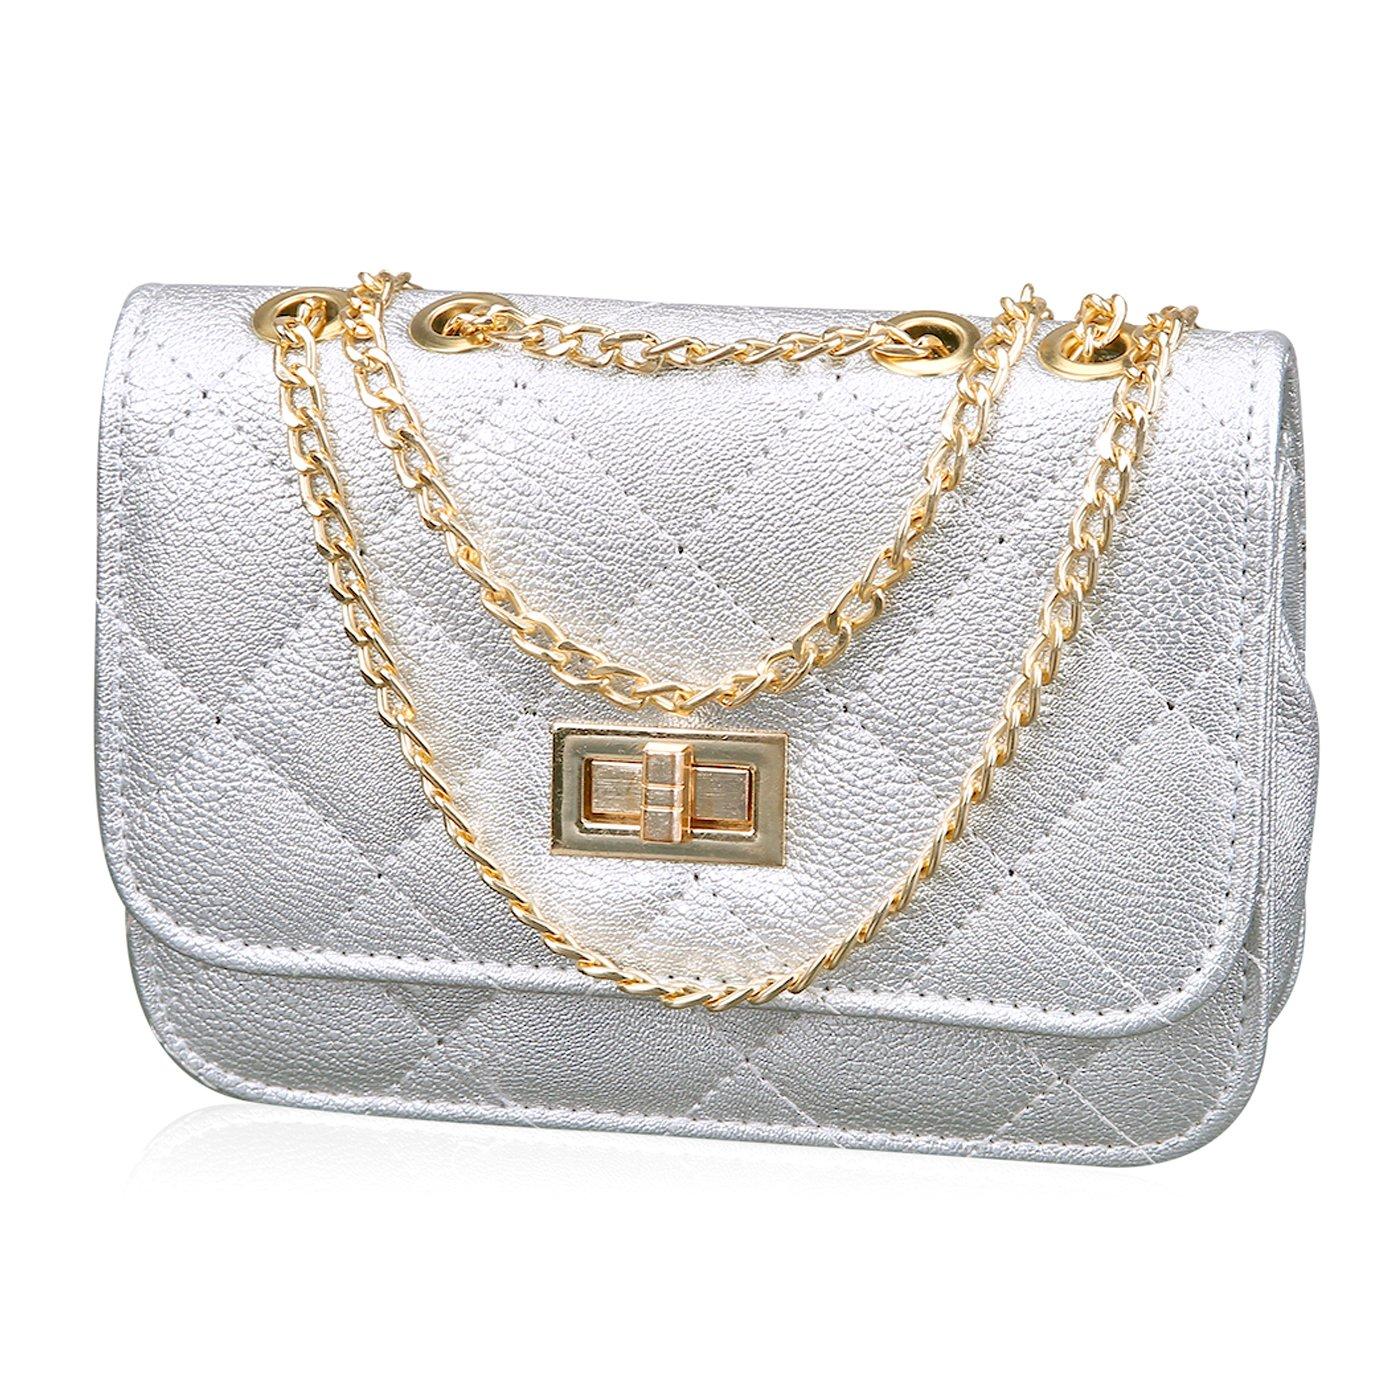 HDE Women's Small Crossbody Handbag Purse Bag with Chain Shoulder Strap (Silver)